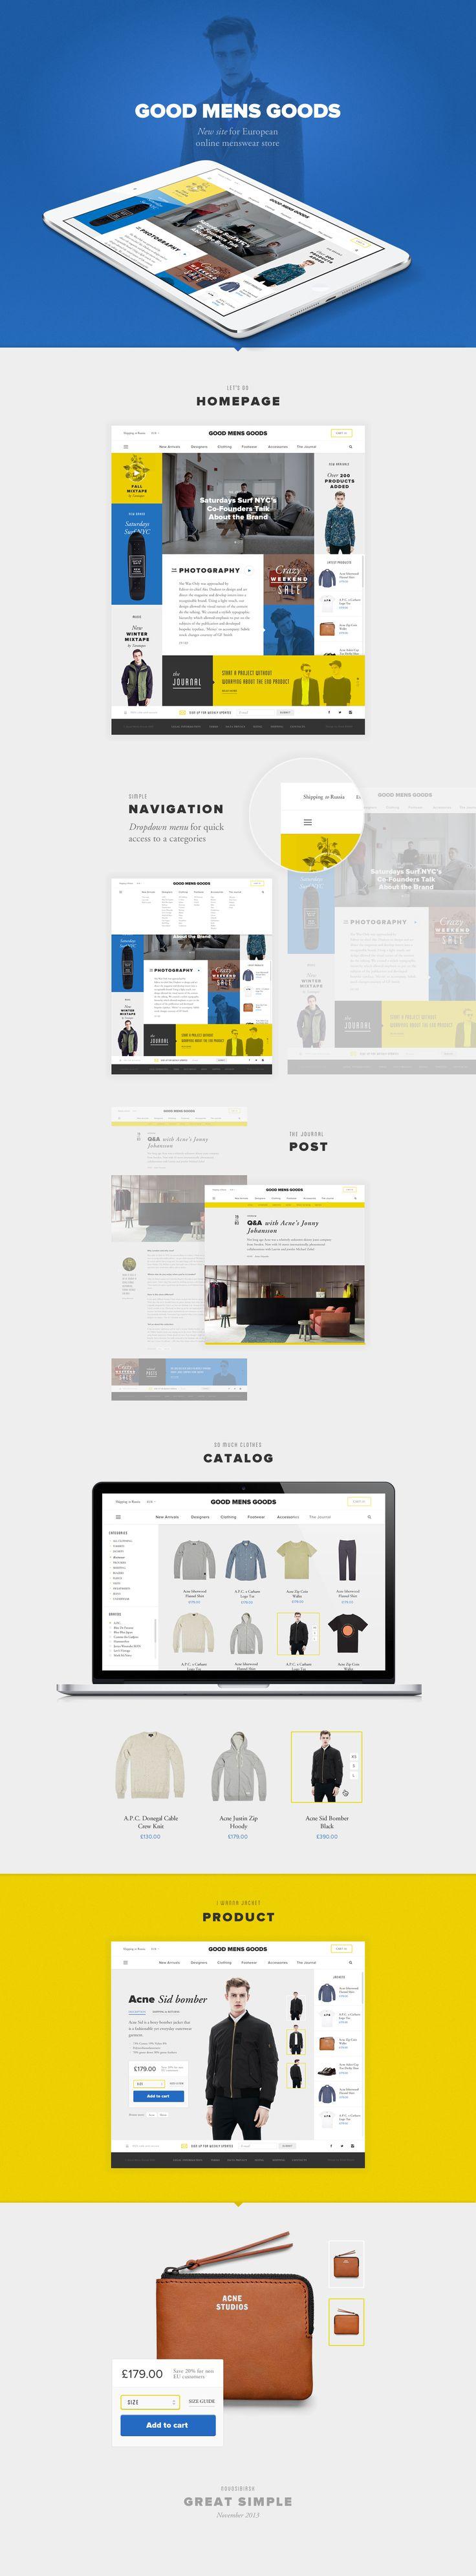 Good Mens Goods, Сайт © Алексей Рыбин #WebDesign #ResponsiveDesign #Responsive #Web #UI #UX #GUI #Amazing #web #design #WebSite